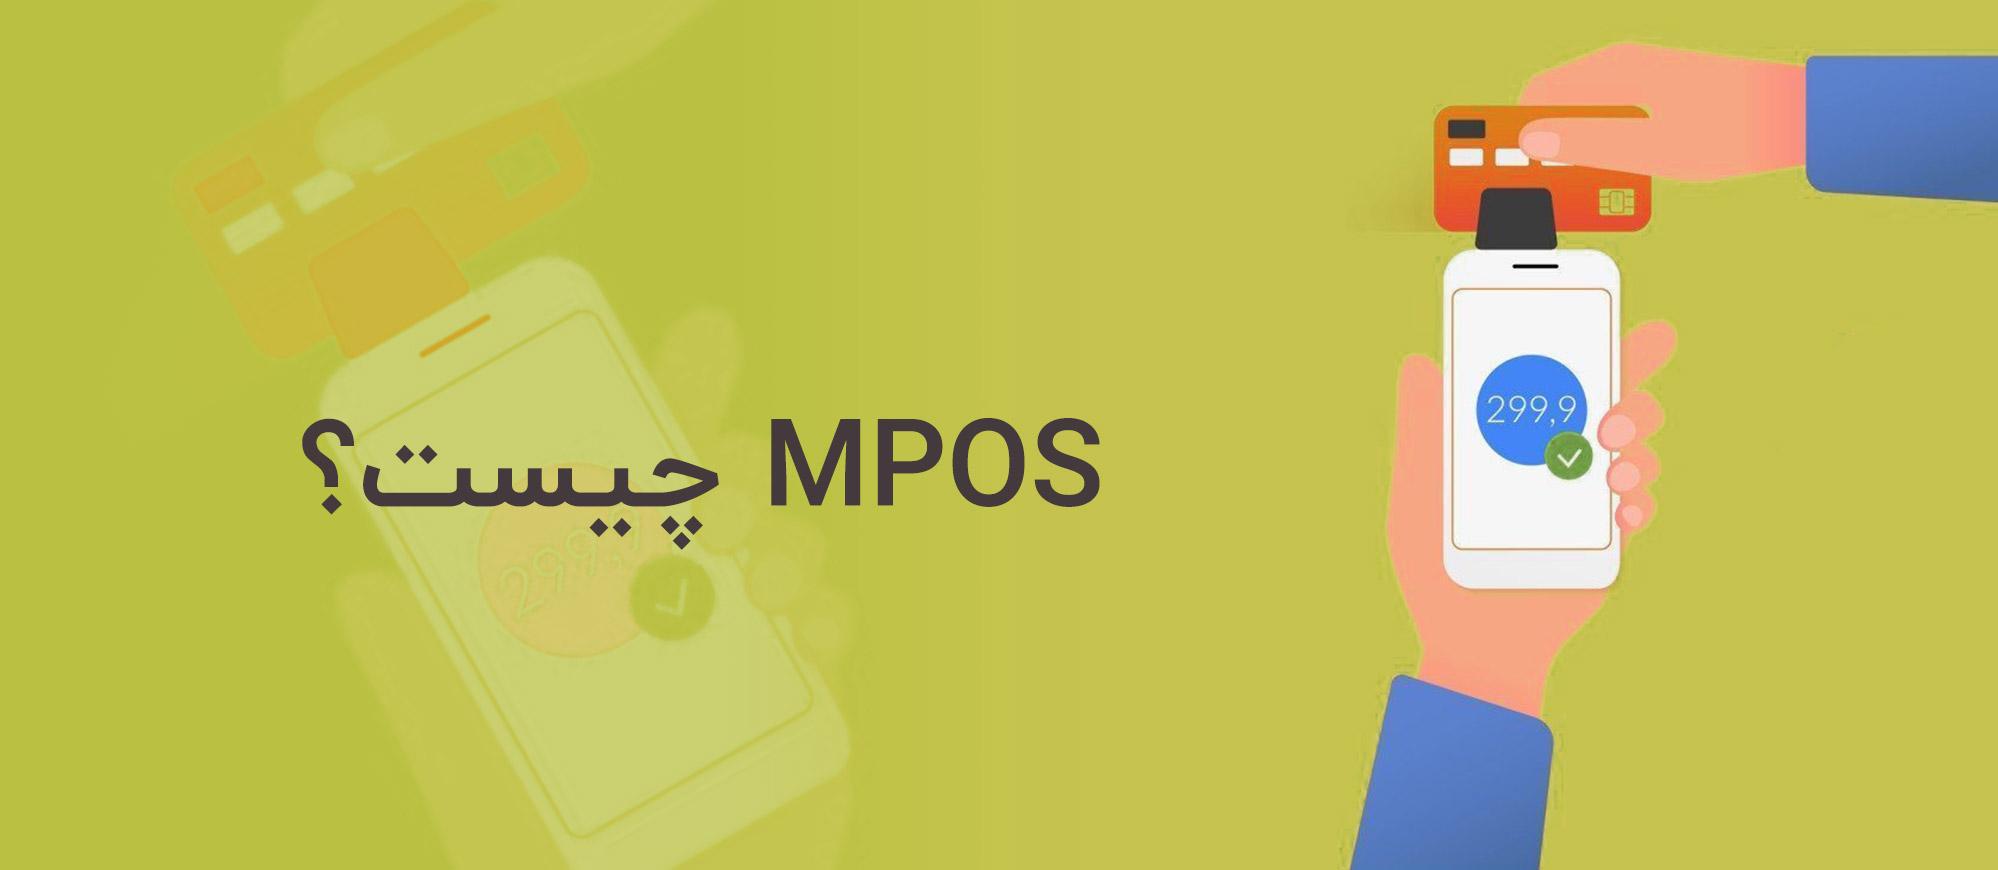 MPOS چیست و چگونه به کسب و کارهای کوچک و سیار کمک میکند؟